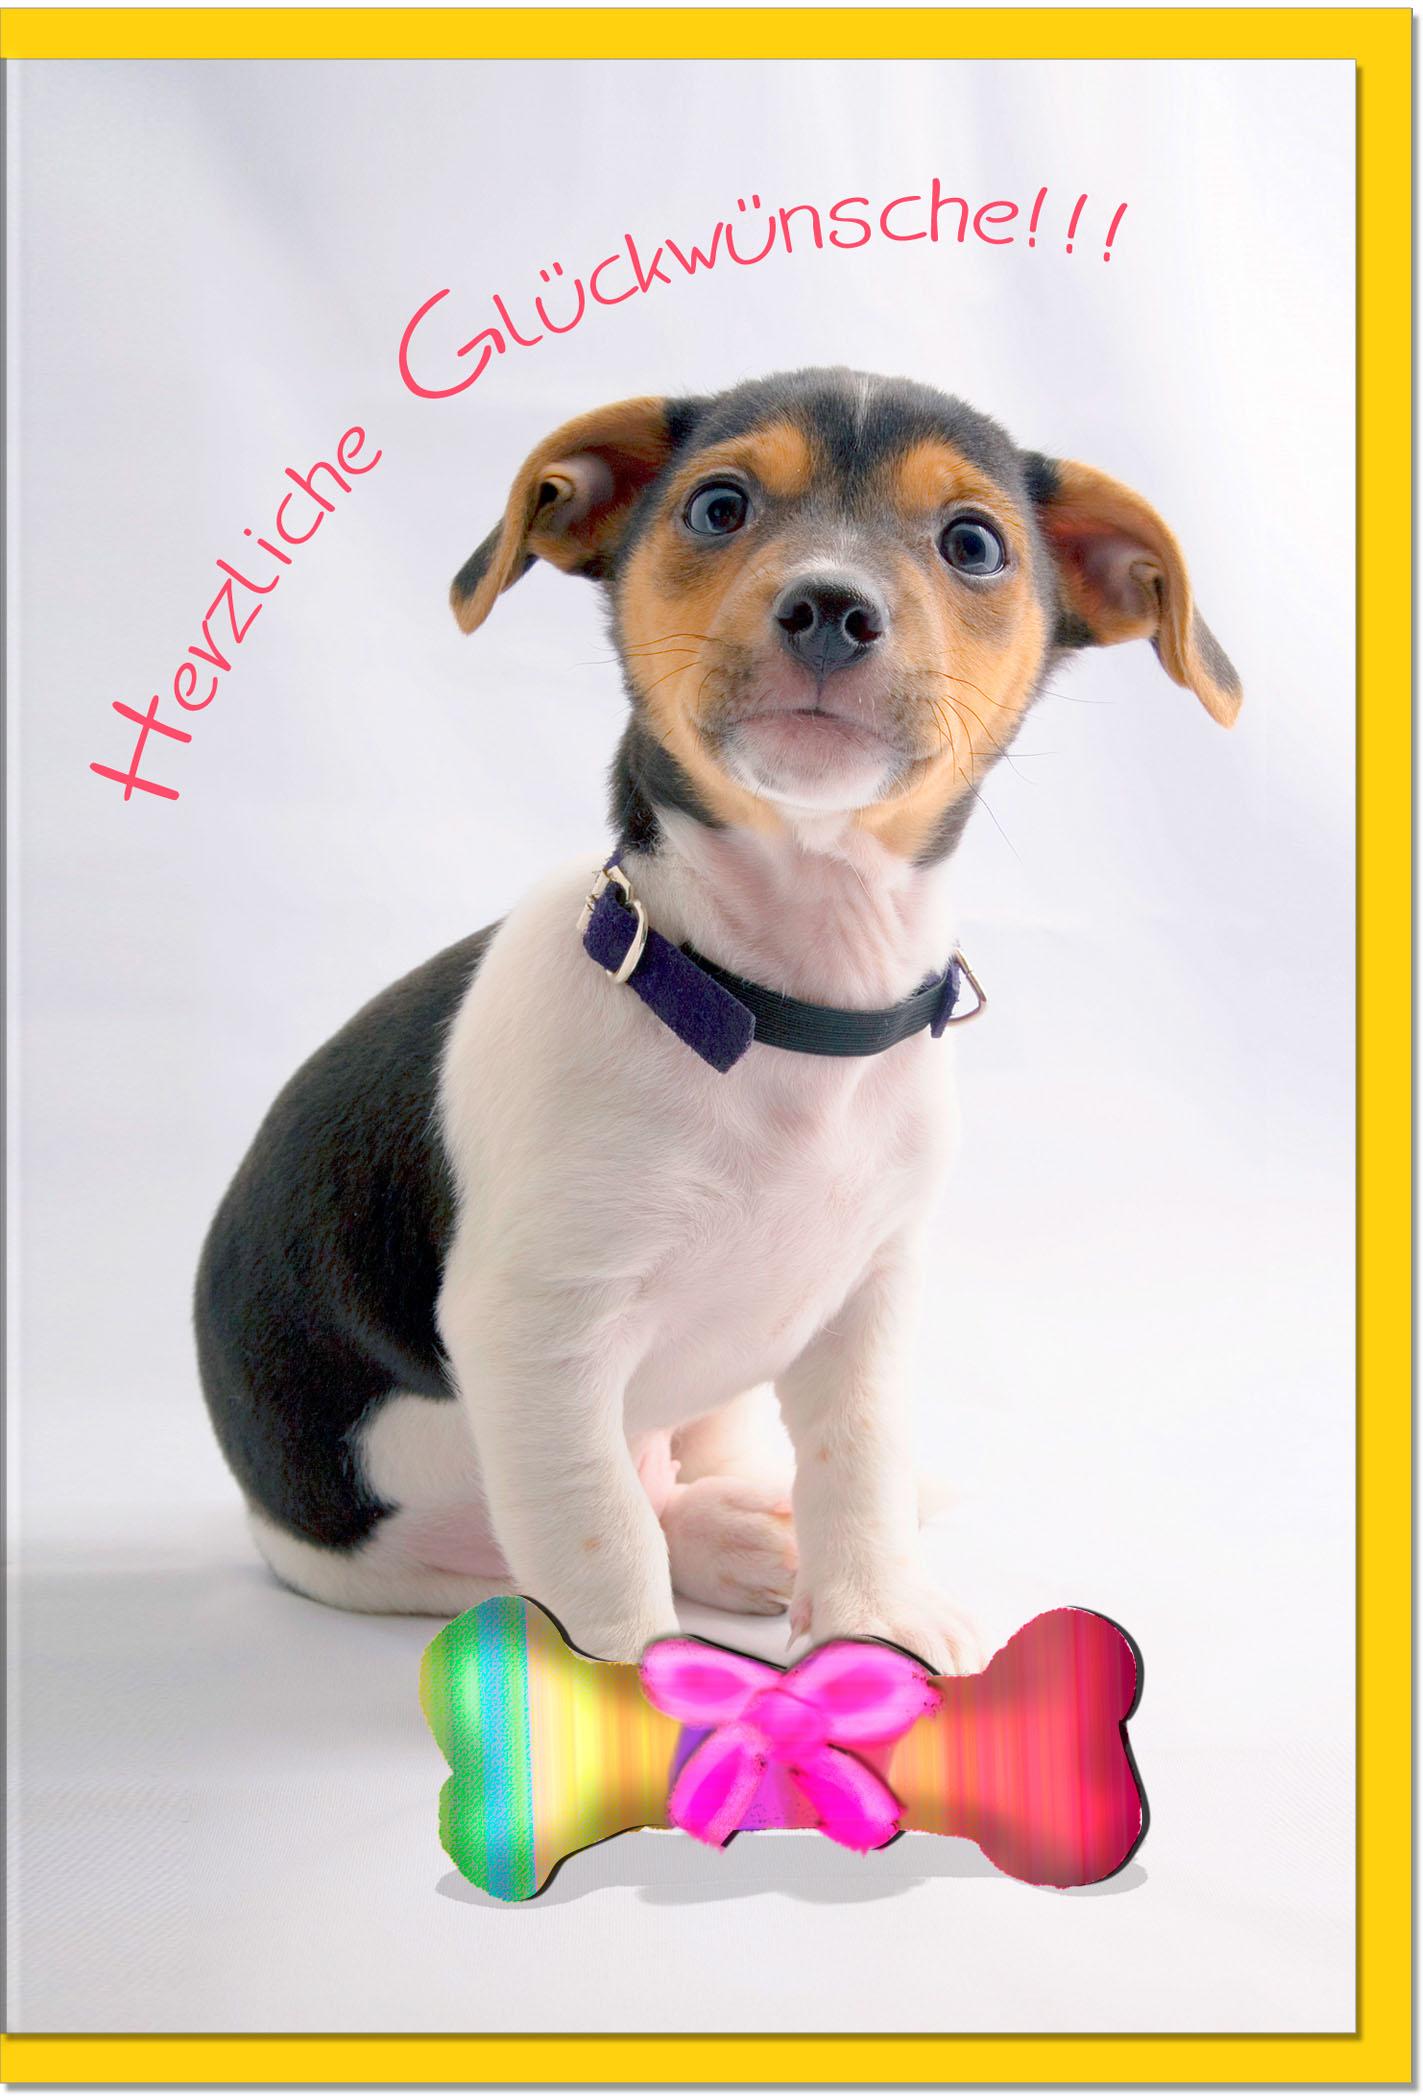 Glückwunschkarten / Grußkarten /Glückwunsch Hund